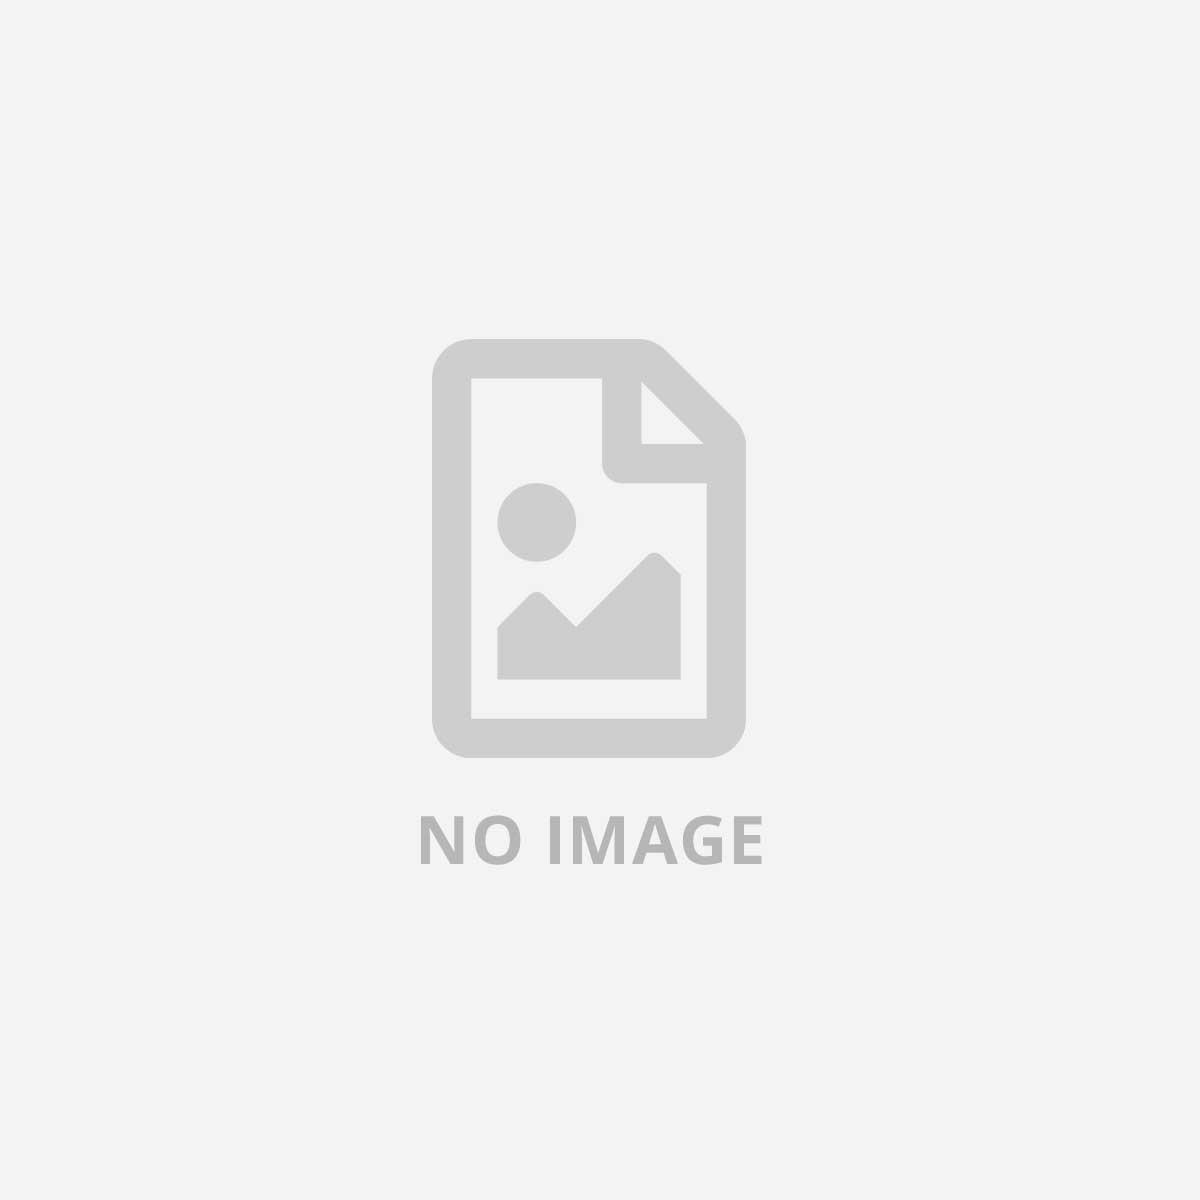 KASPERSKY KAS SECUR X MS OFFICE 365 (100-149)